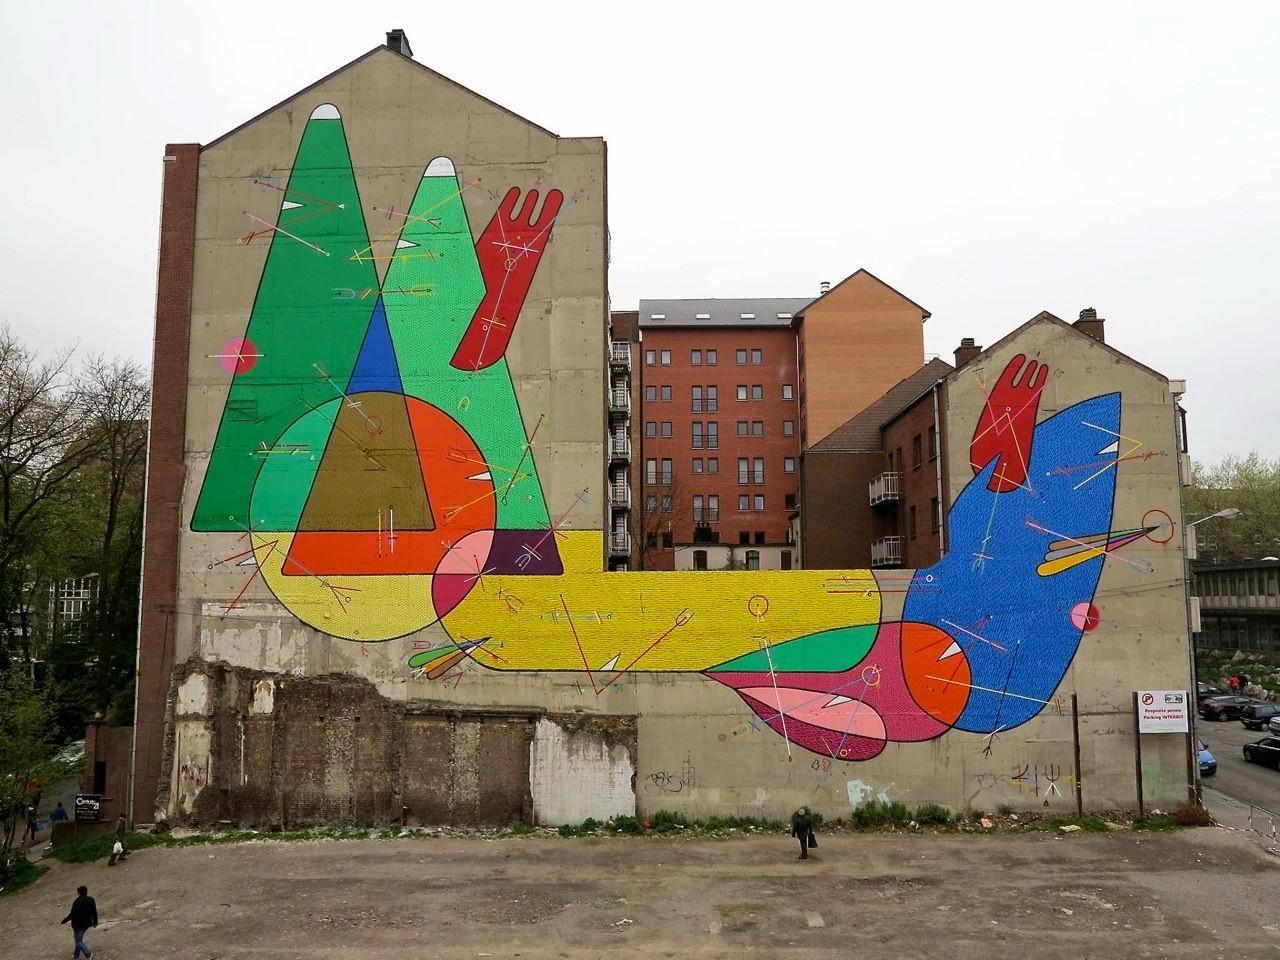 Sixe Paredes New Mural For Asphalt – Charleroi, Belgium